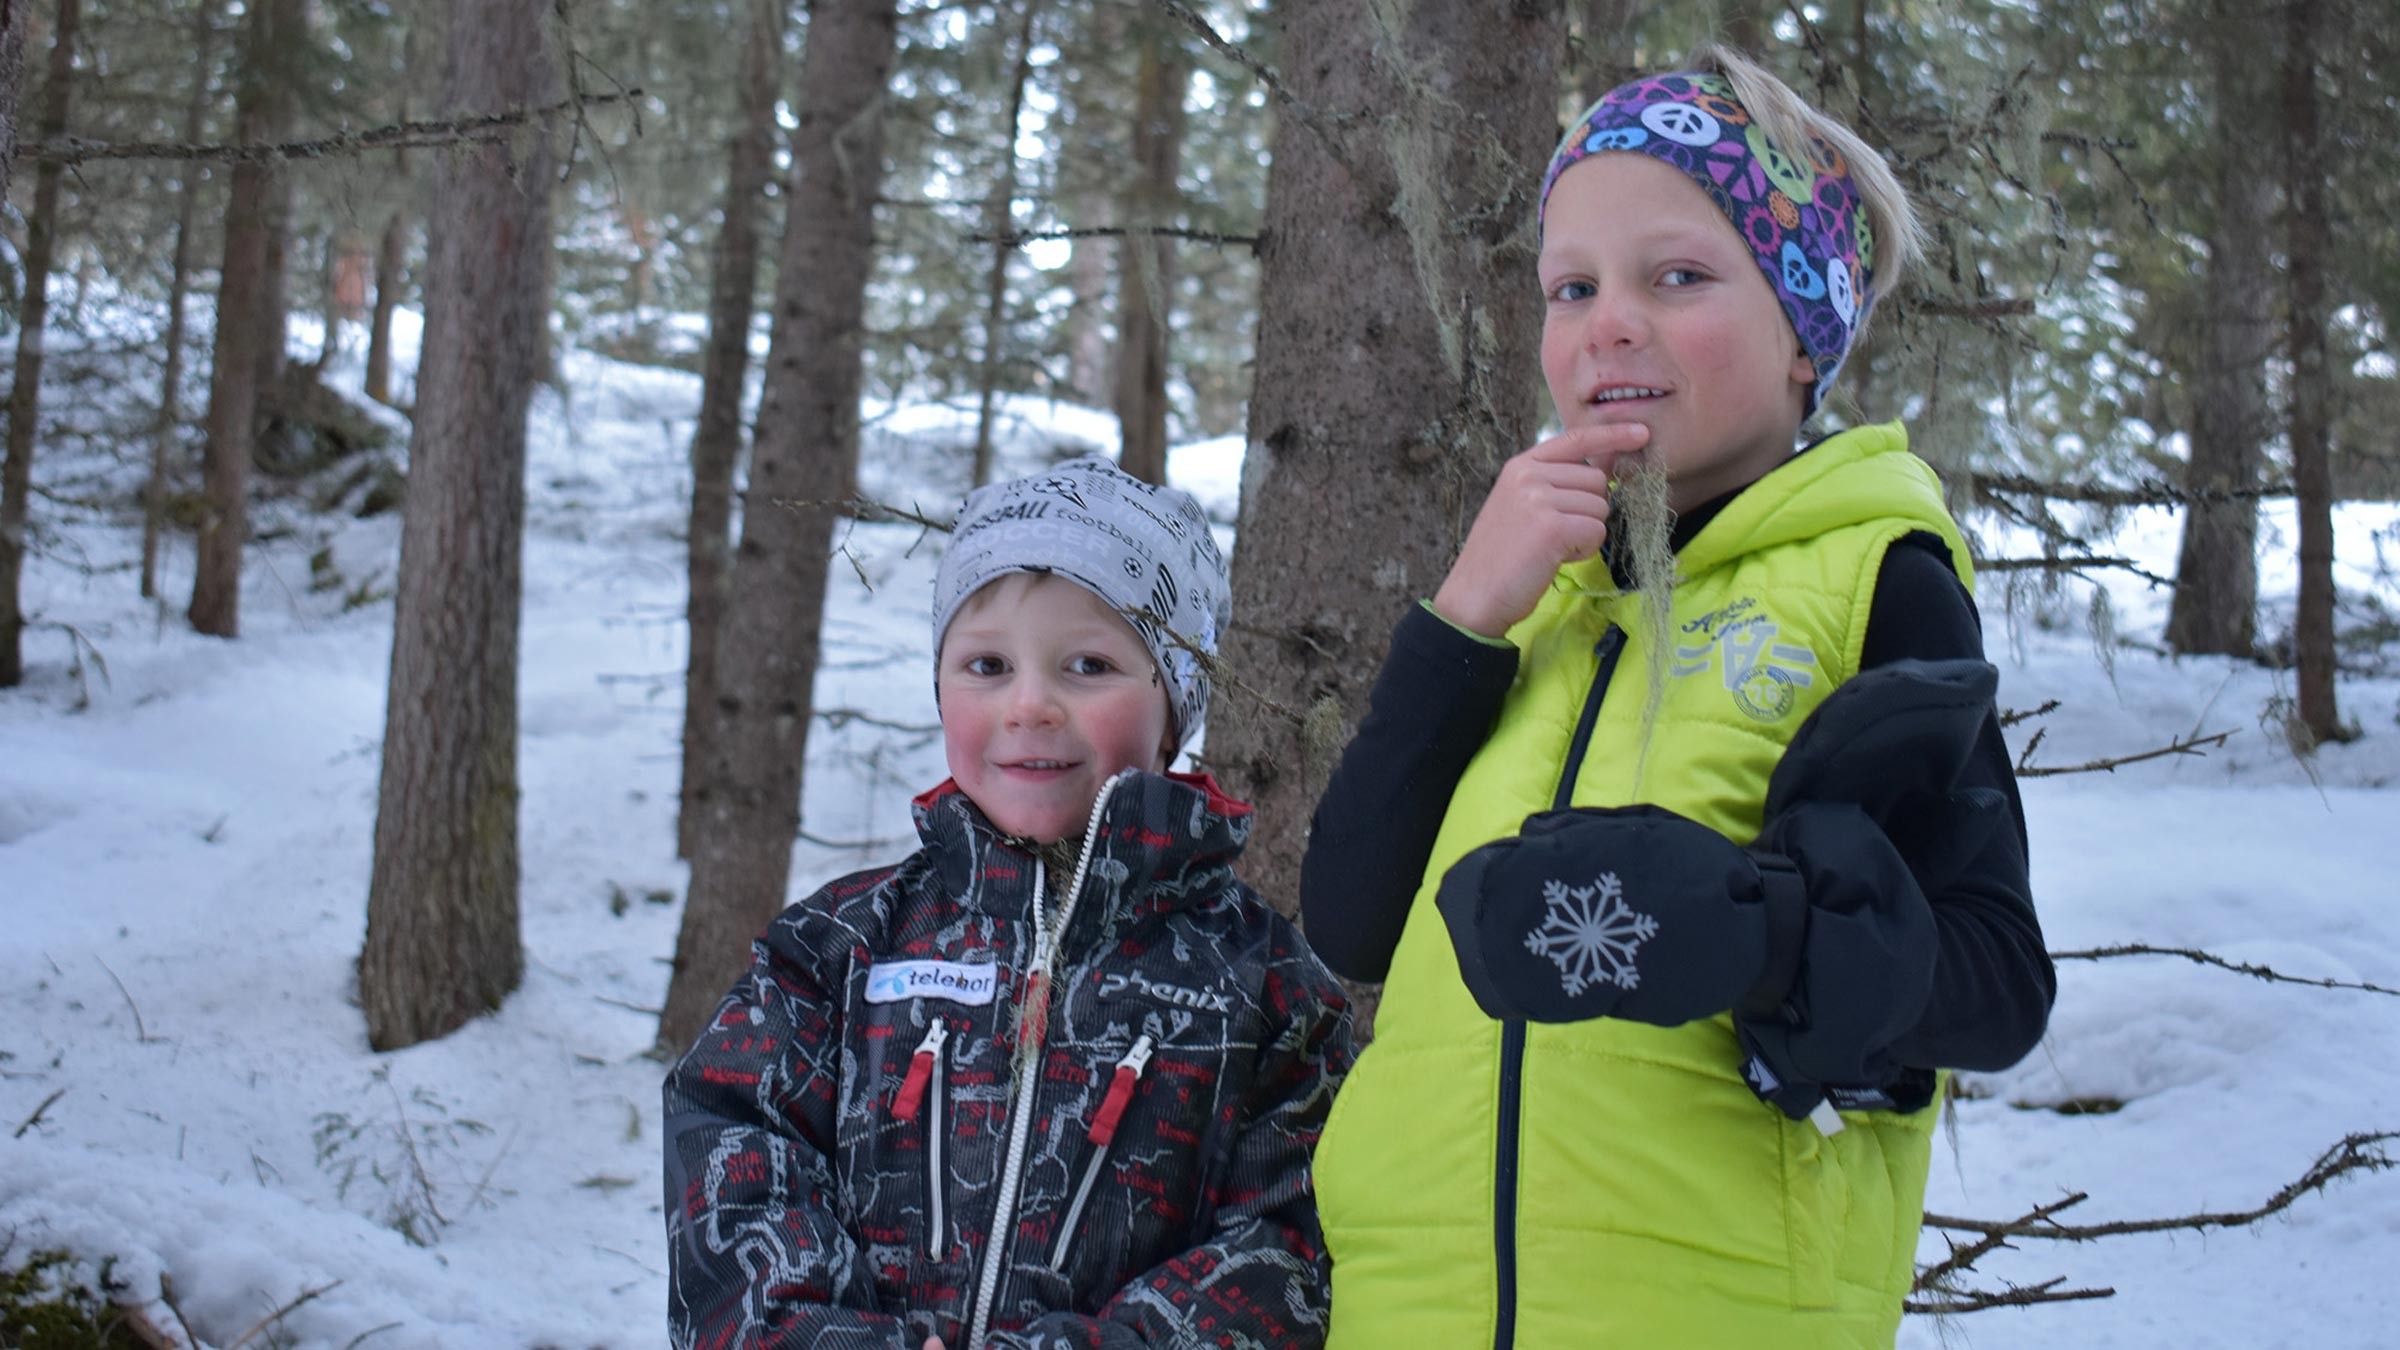 Kinder spielen mit Baumbart - Rodelbahn Wurzbergalm Ötztal